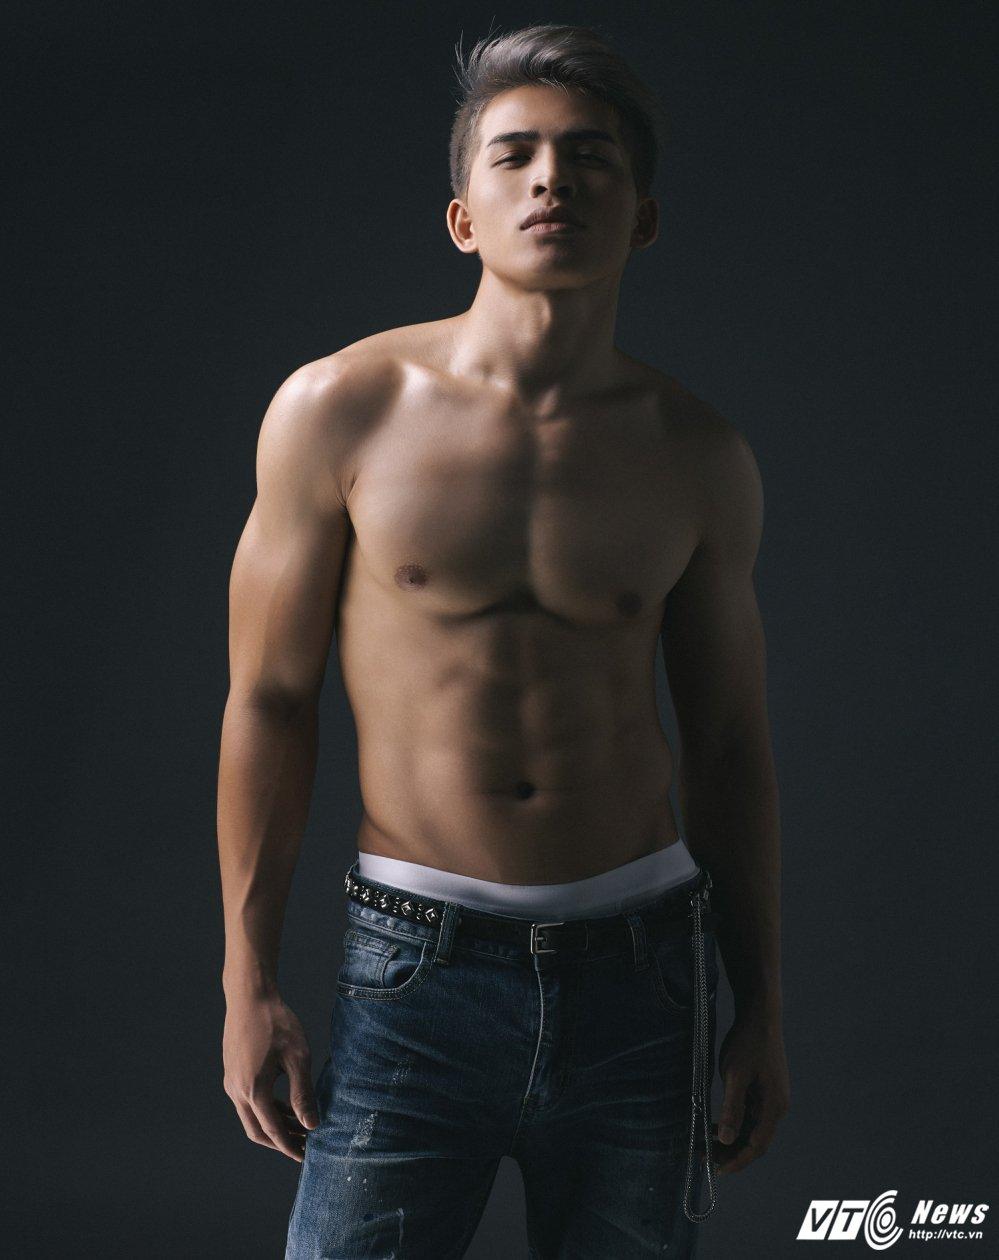 Quoc Thien: 'Tai sao phai song theo su xet doan cua nguoi khac ma khong la chinh minh?' hinh anh 3